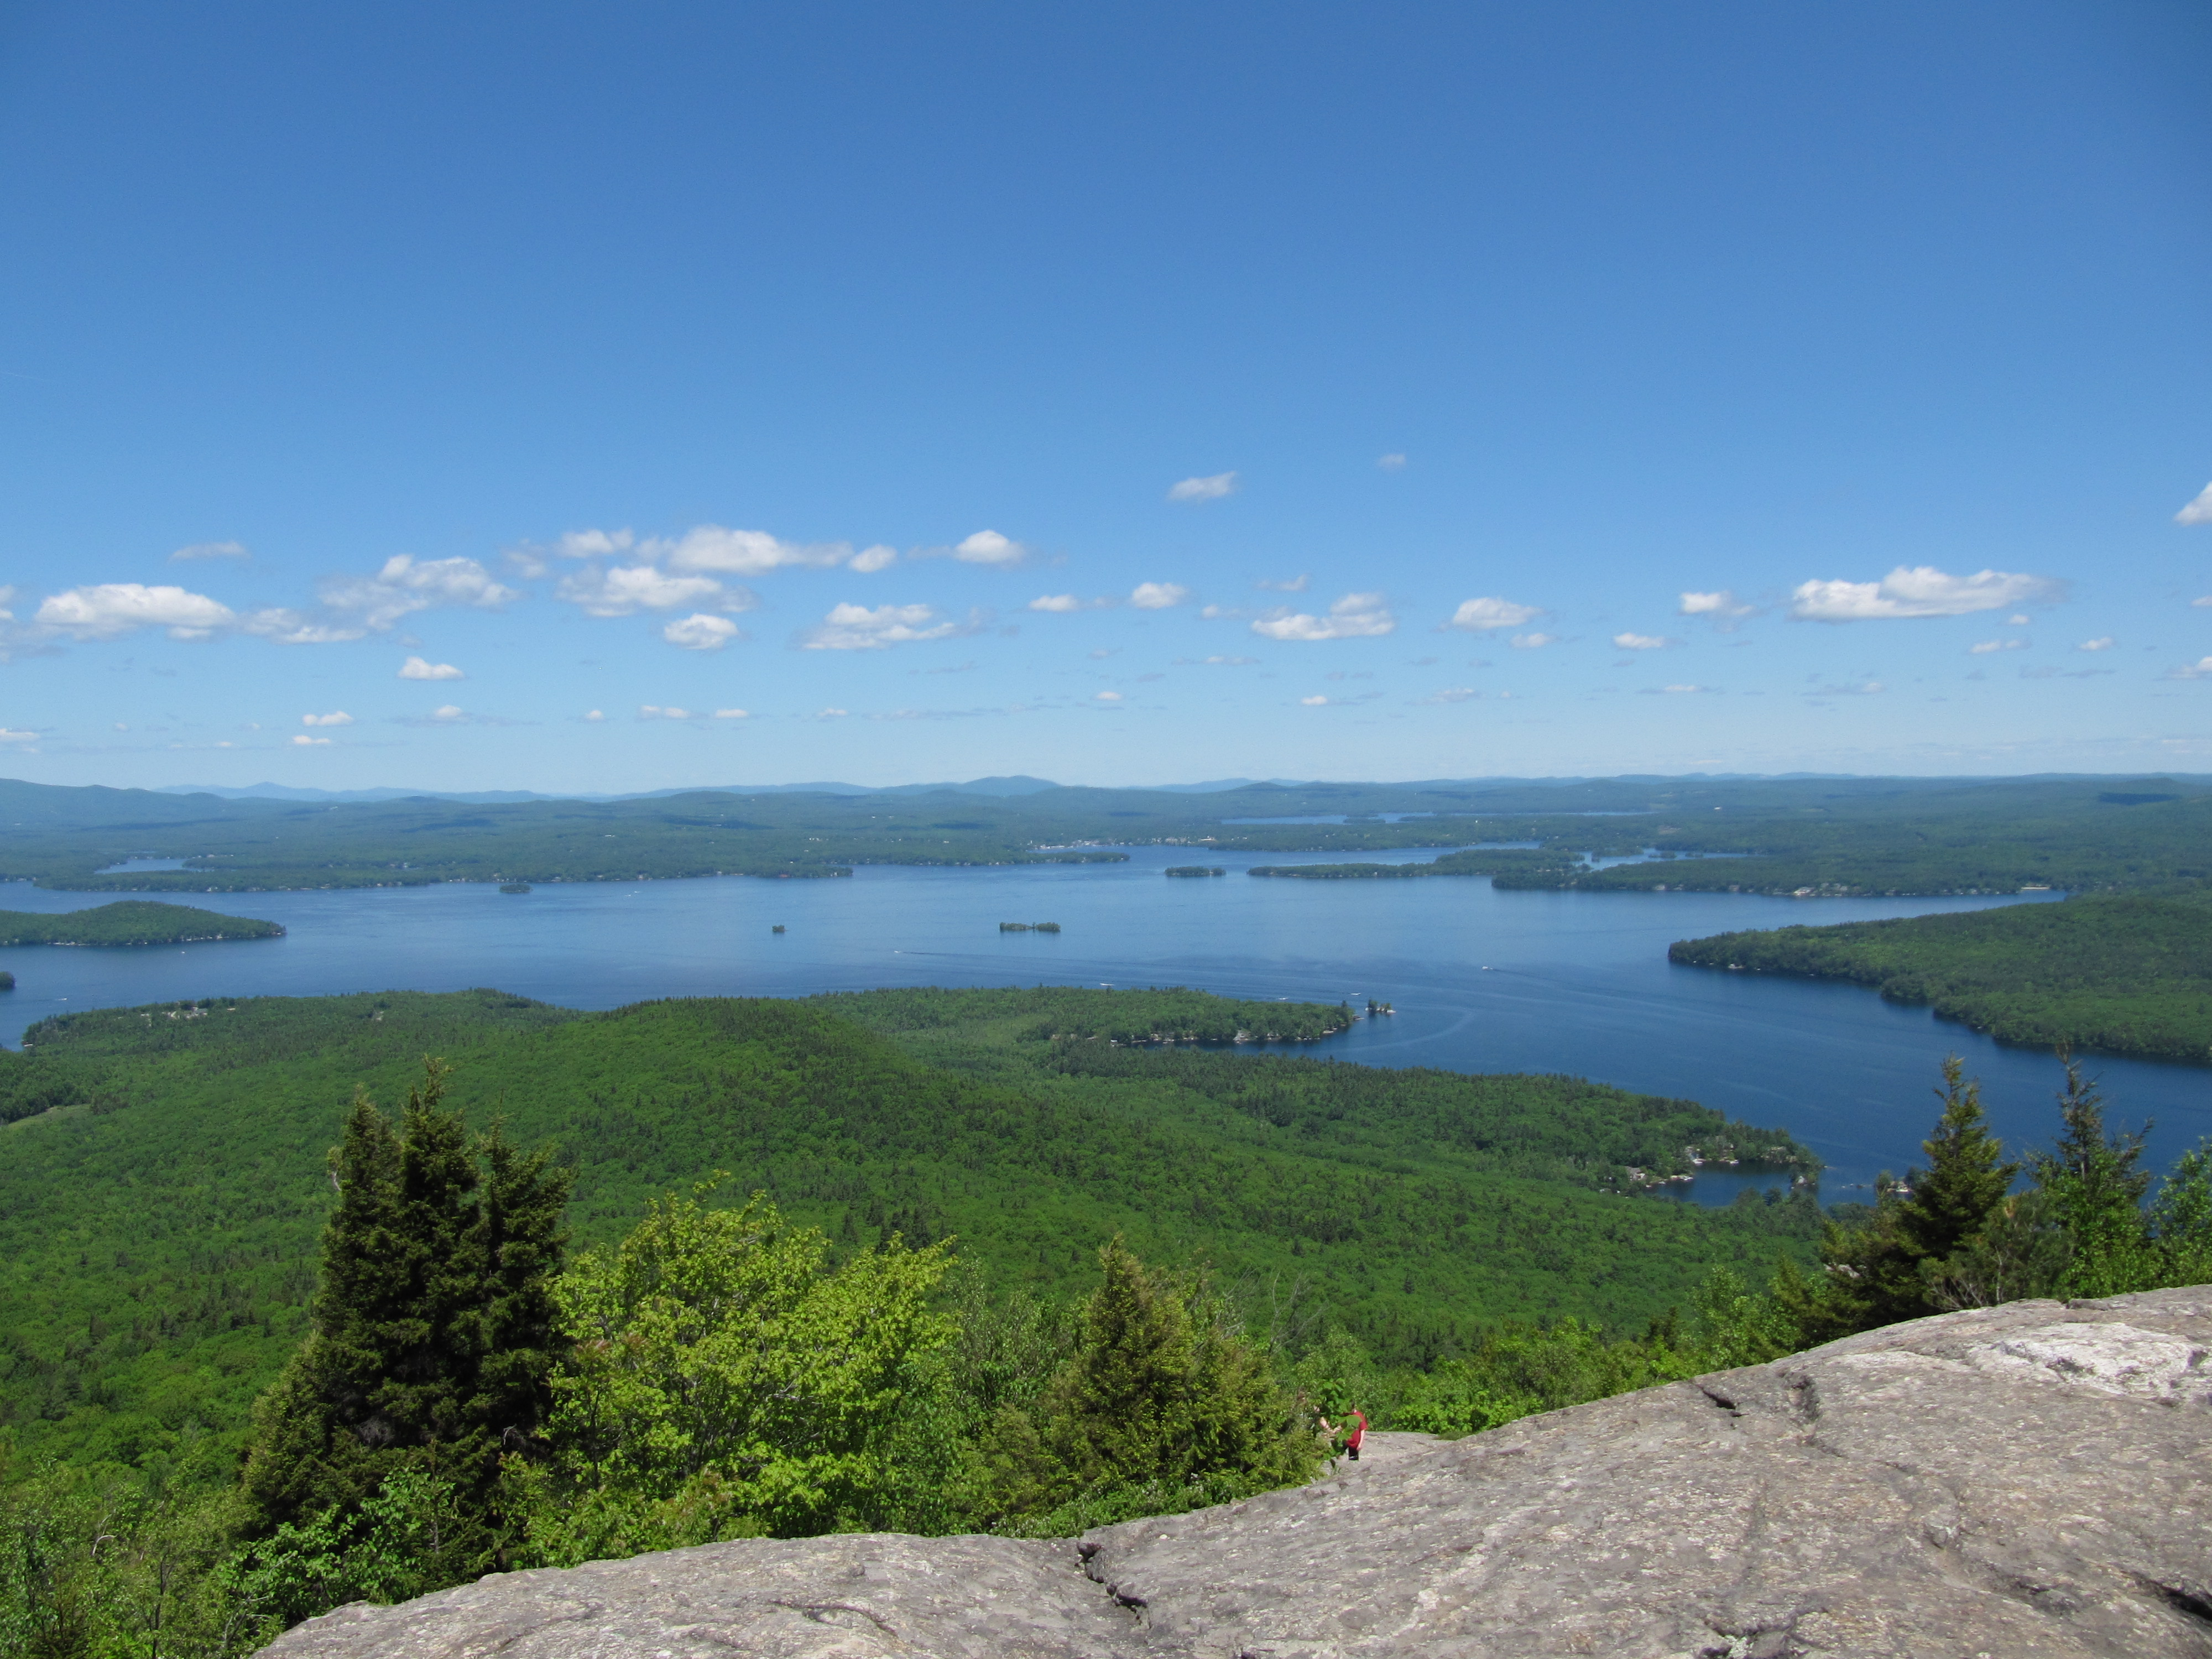 File:Mount Major Trail, Alton, New Hampshire.jpg - Wikimedia Commons